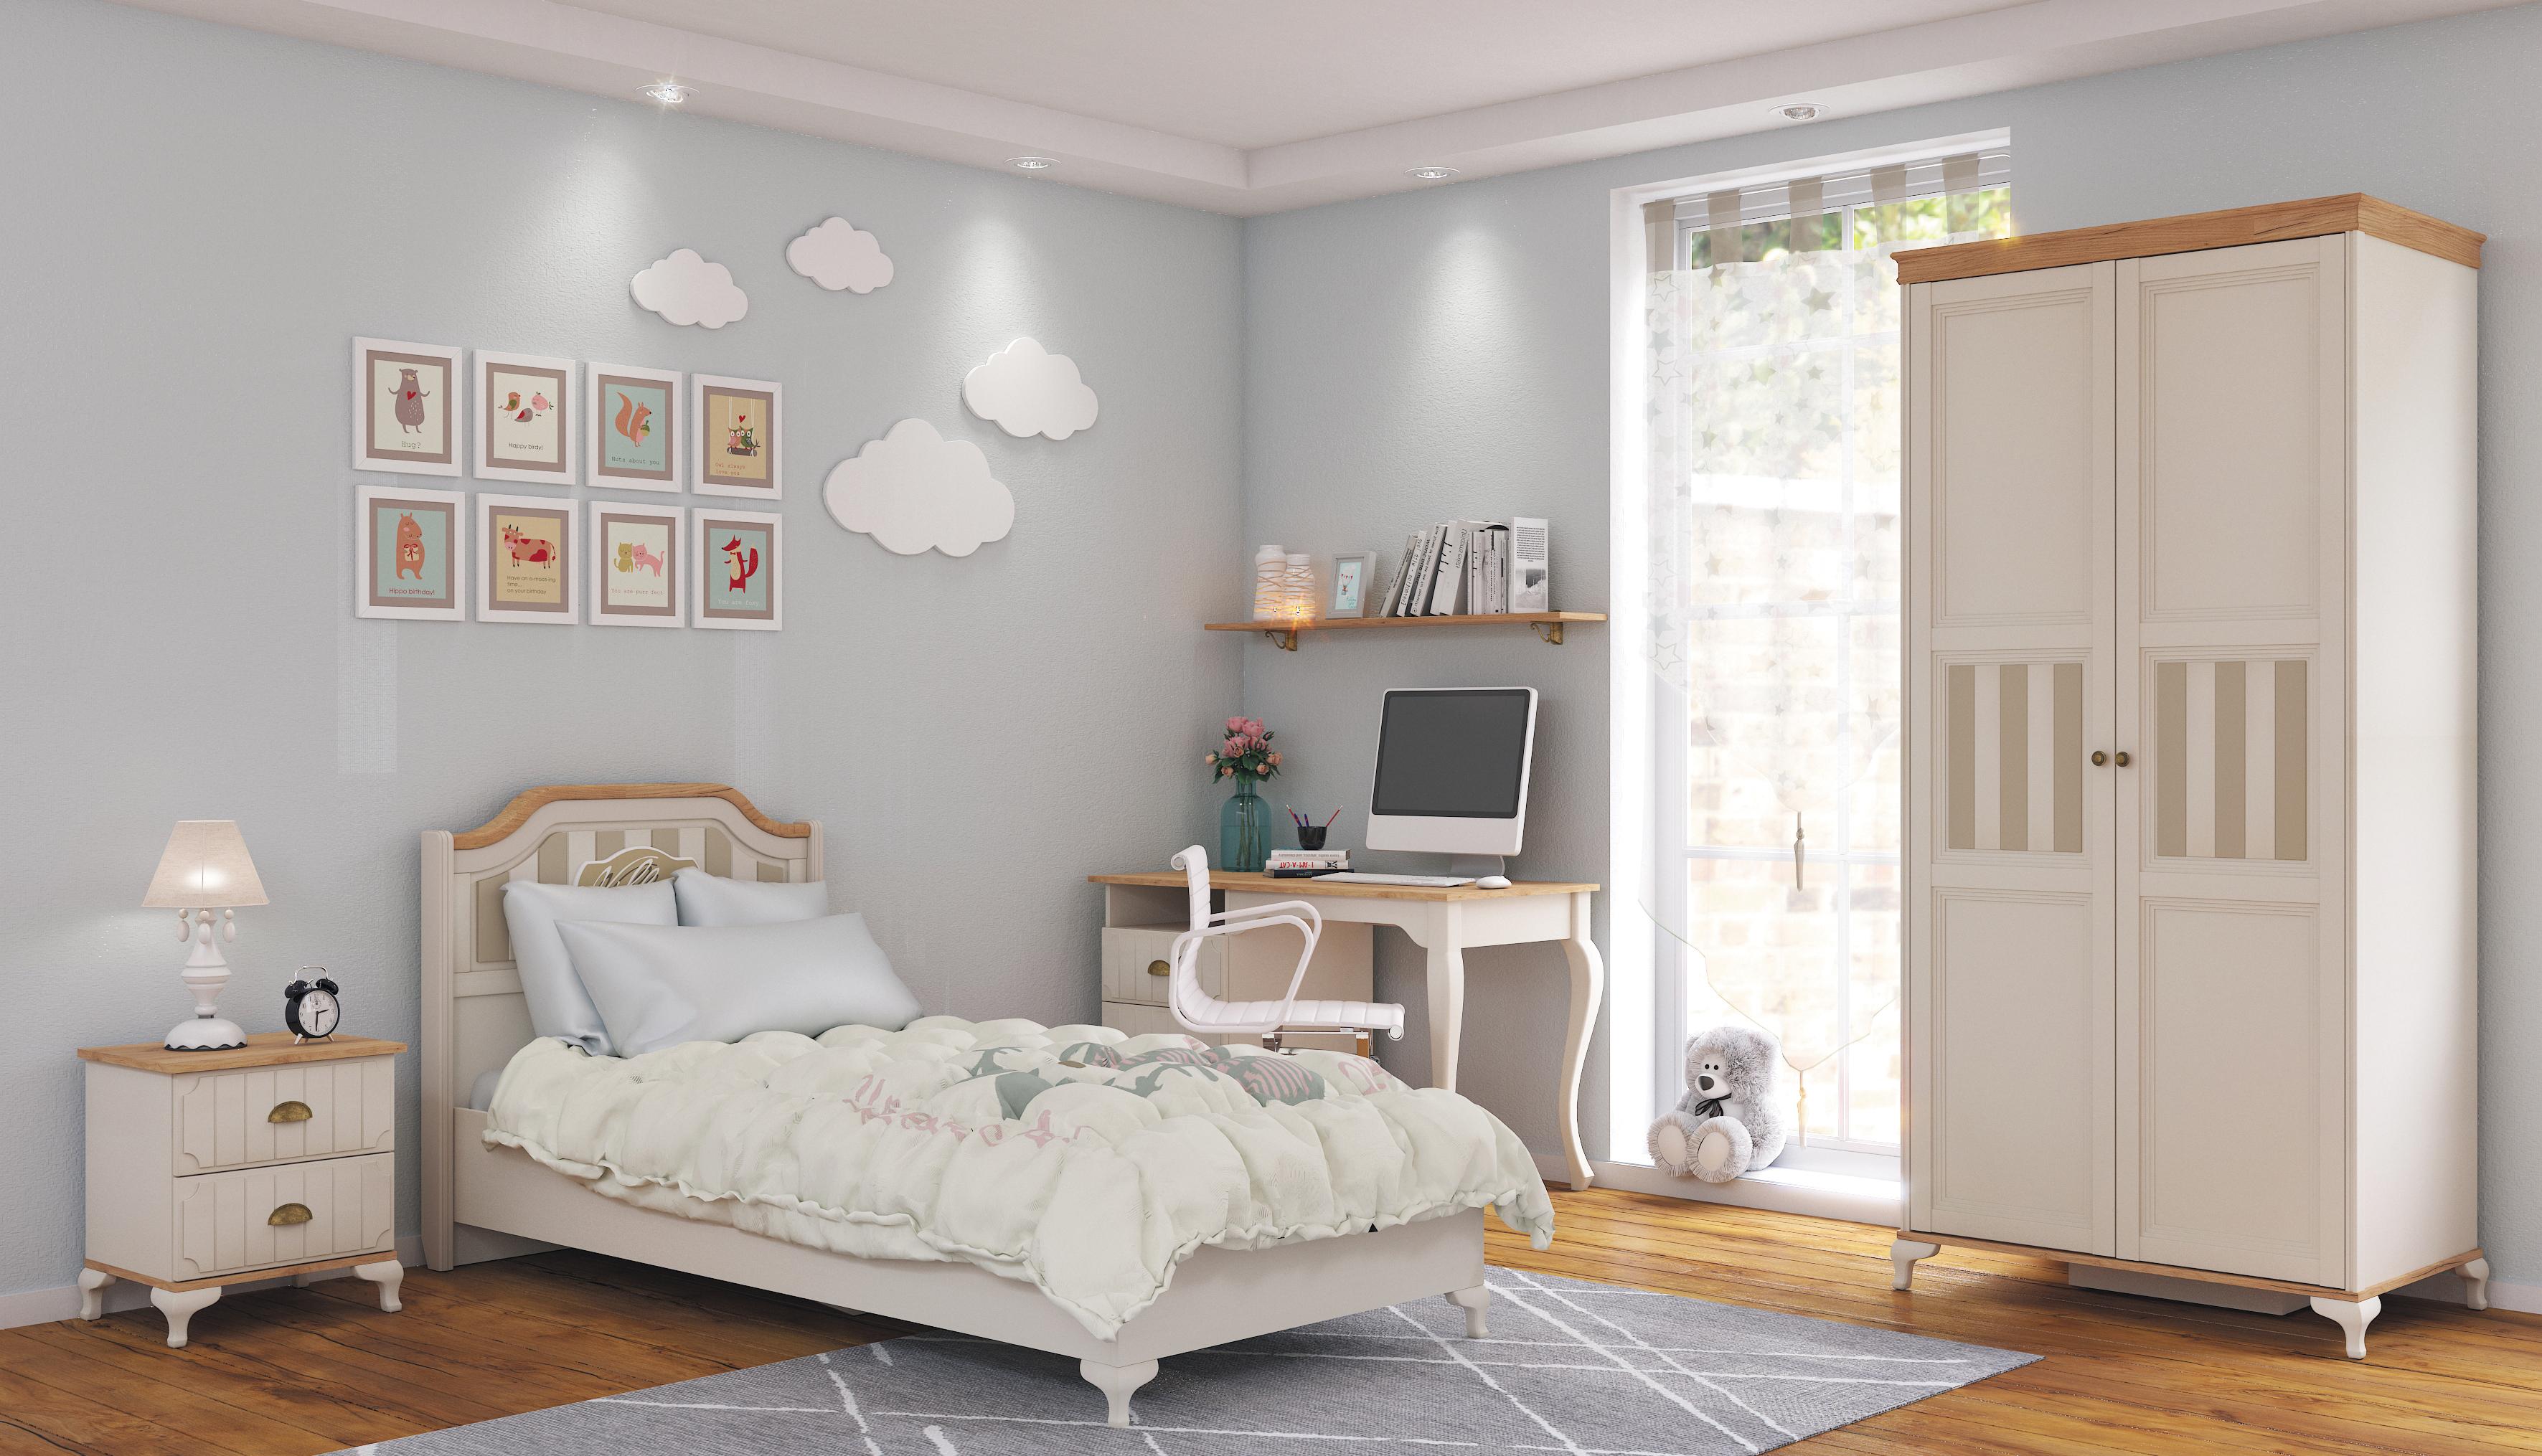 Kinderzimmer Komplett Villagio 5-Teilig Landhausstil